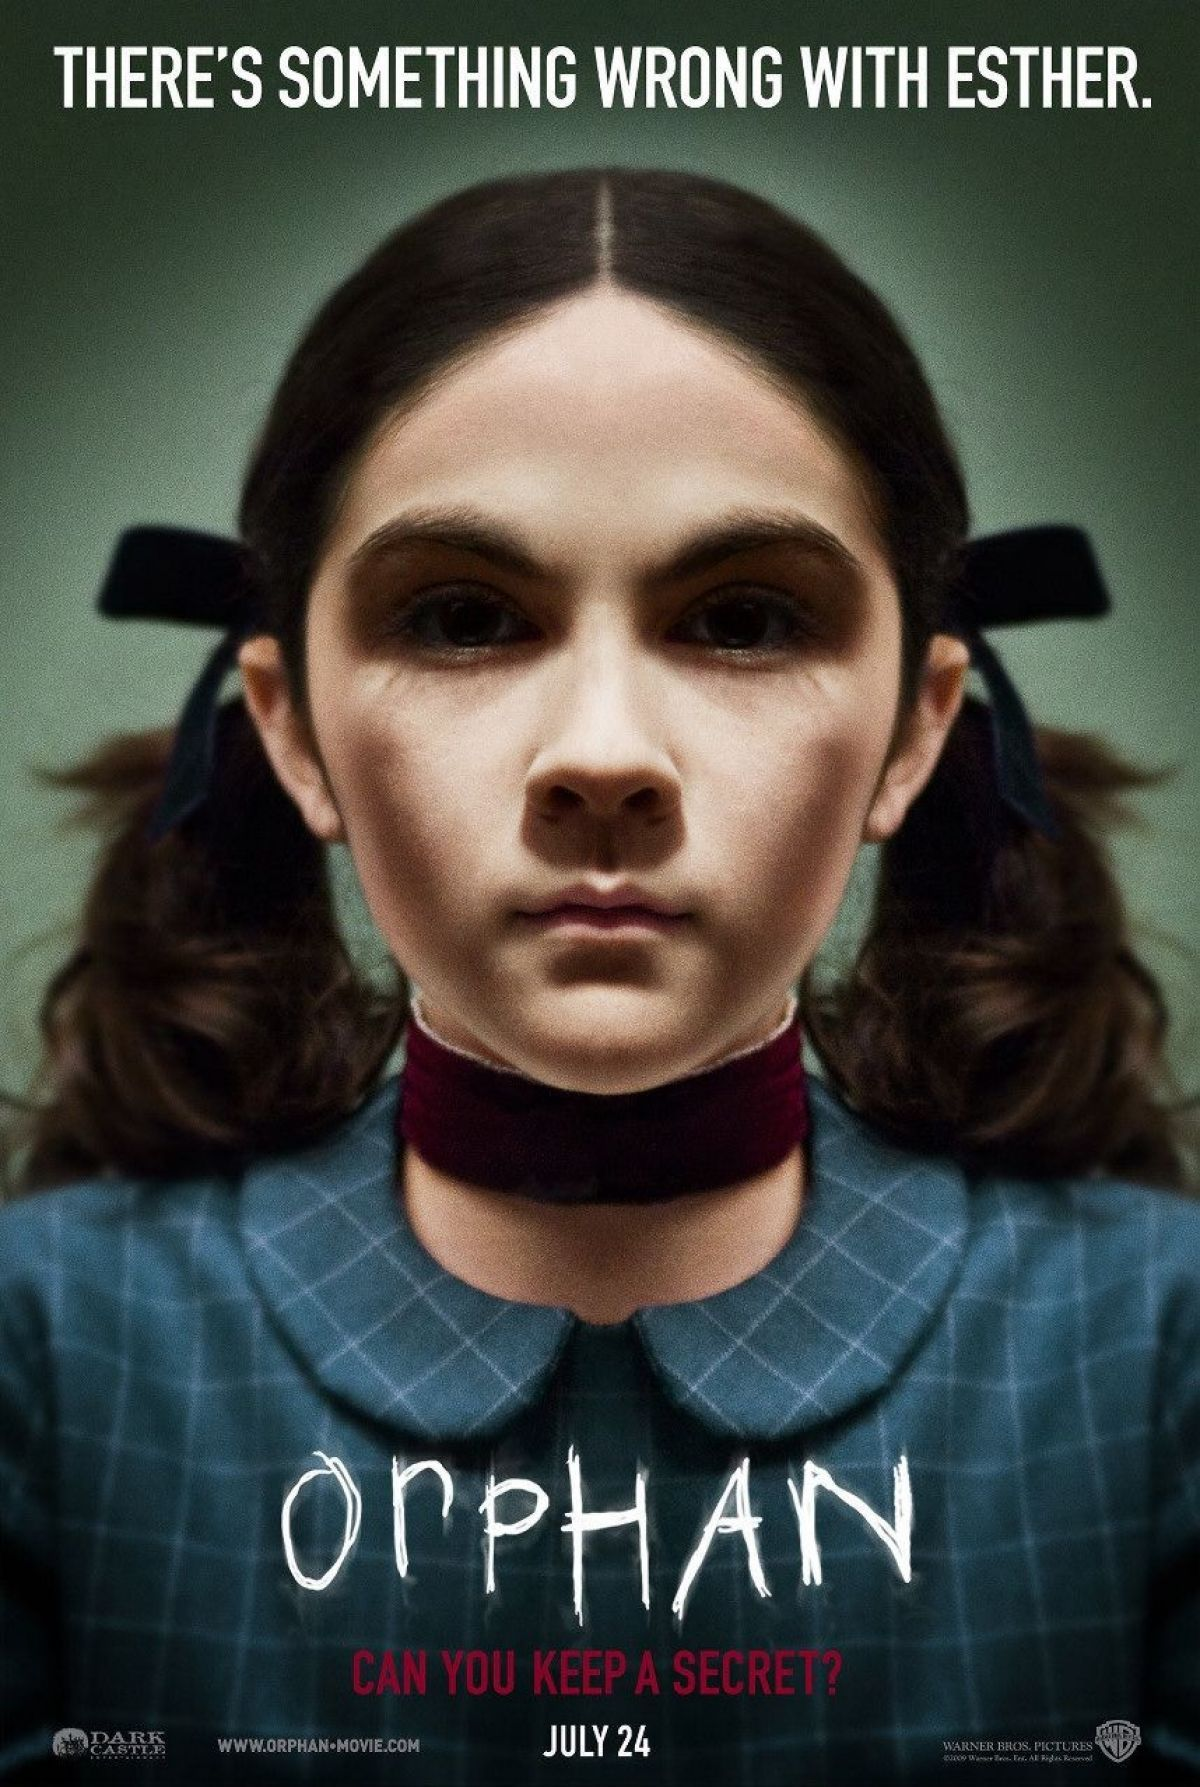 Orphan (2009) [1200 1787] Film, Cinéma, Thérèse